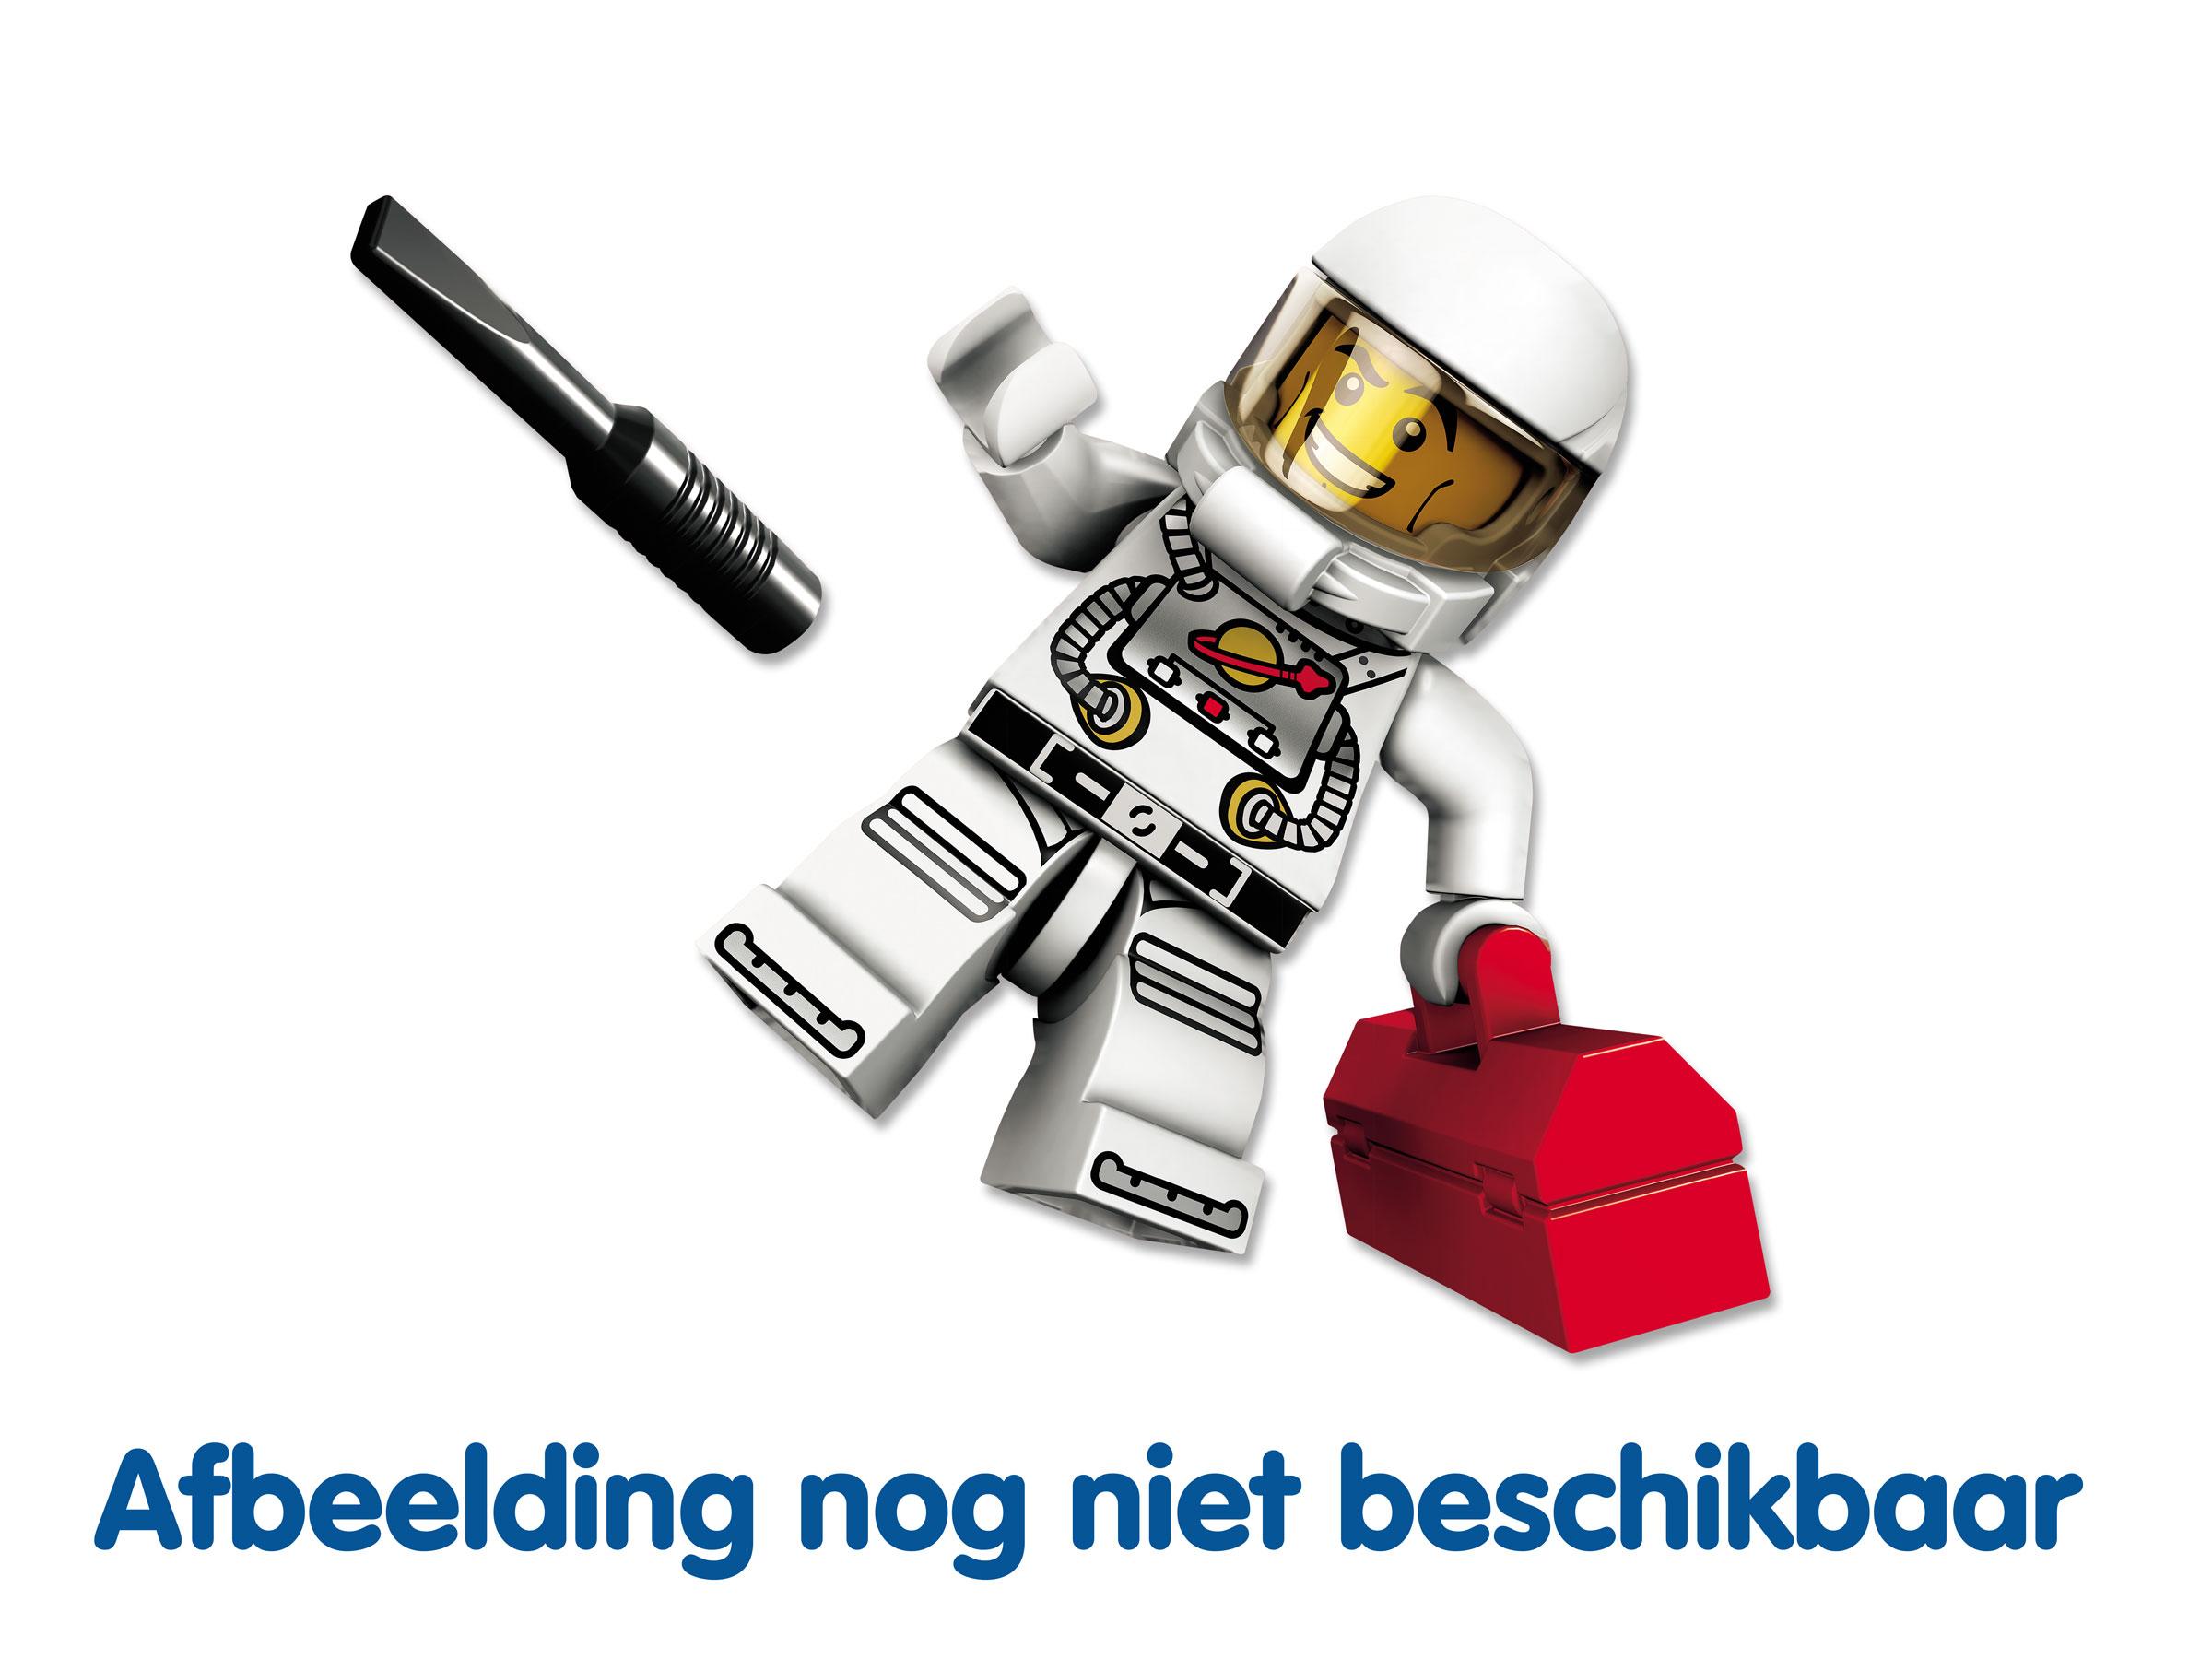 LEGO 21302 The Big Bang Theory